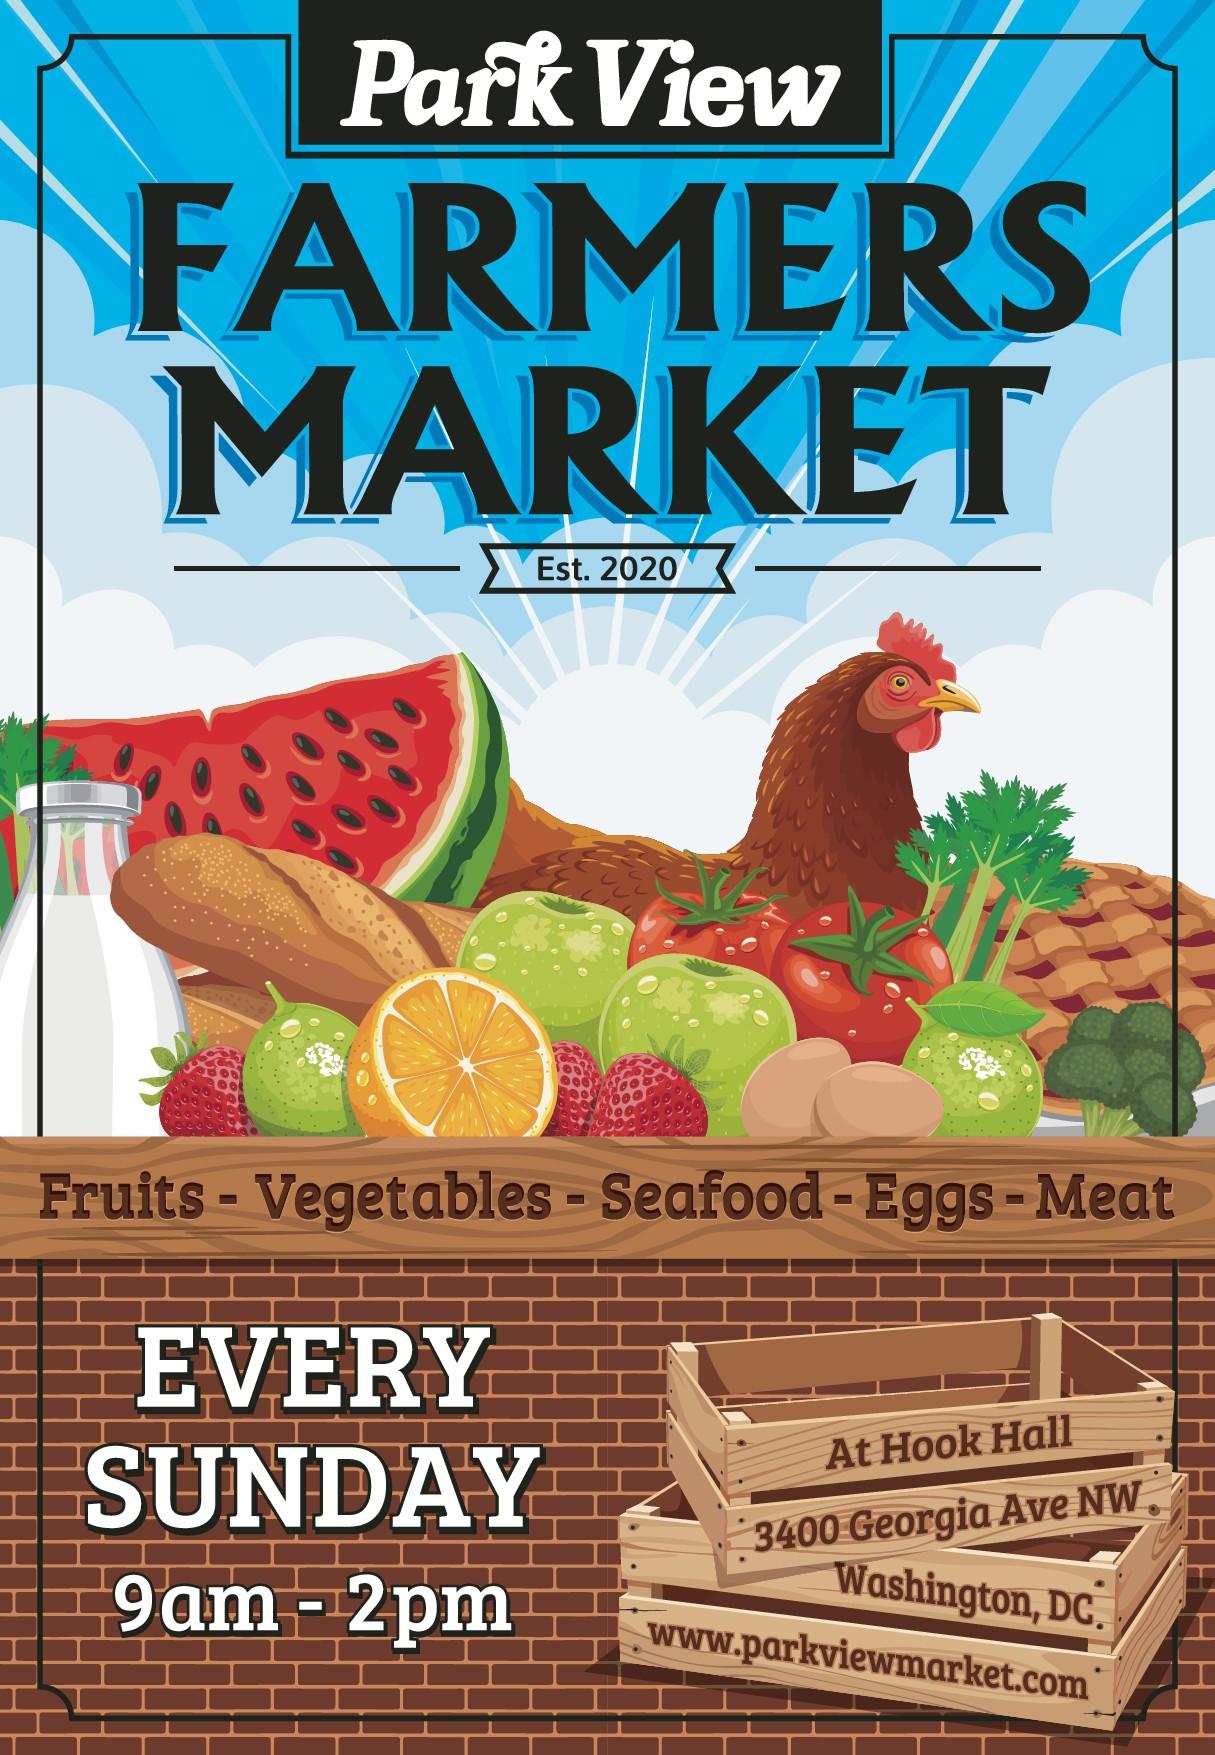 Poster design for Park View Market